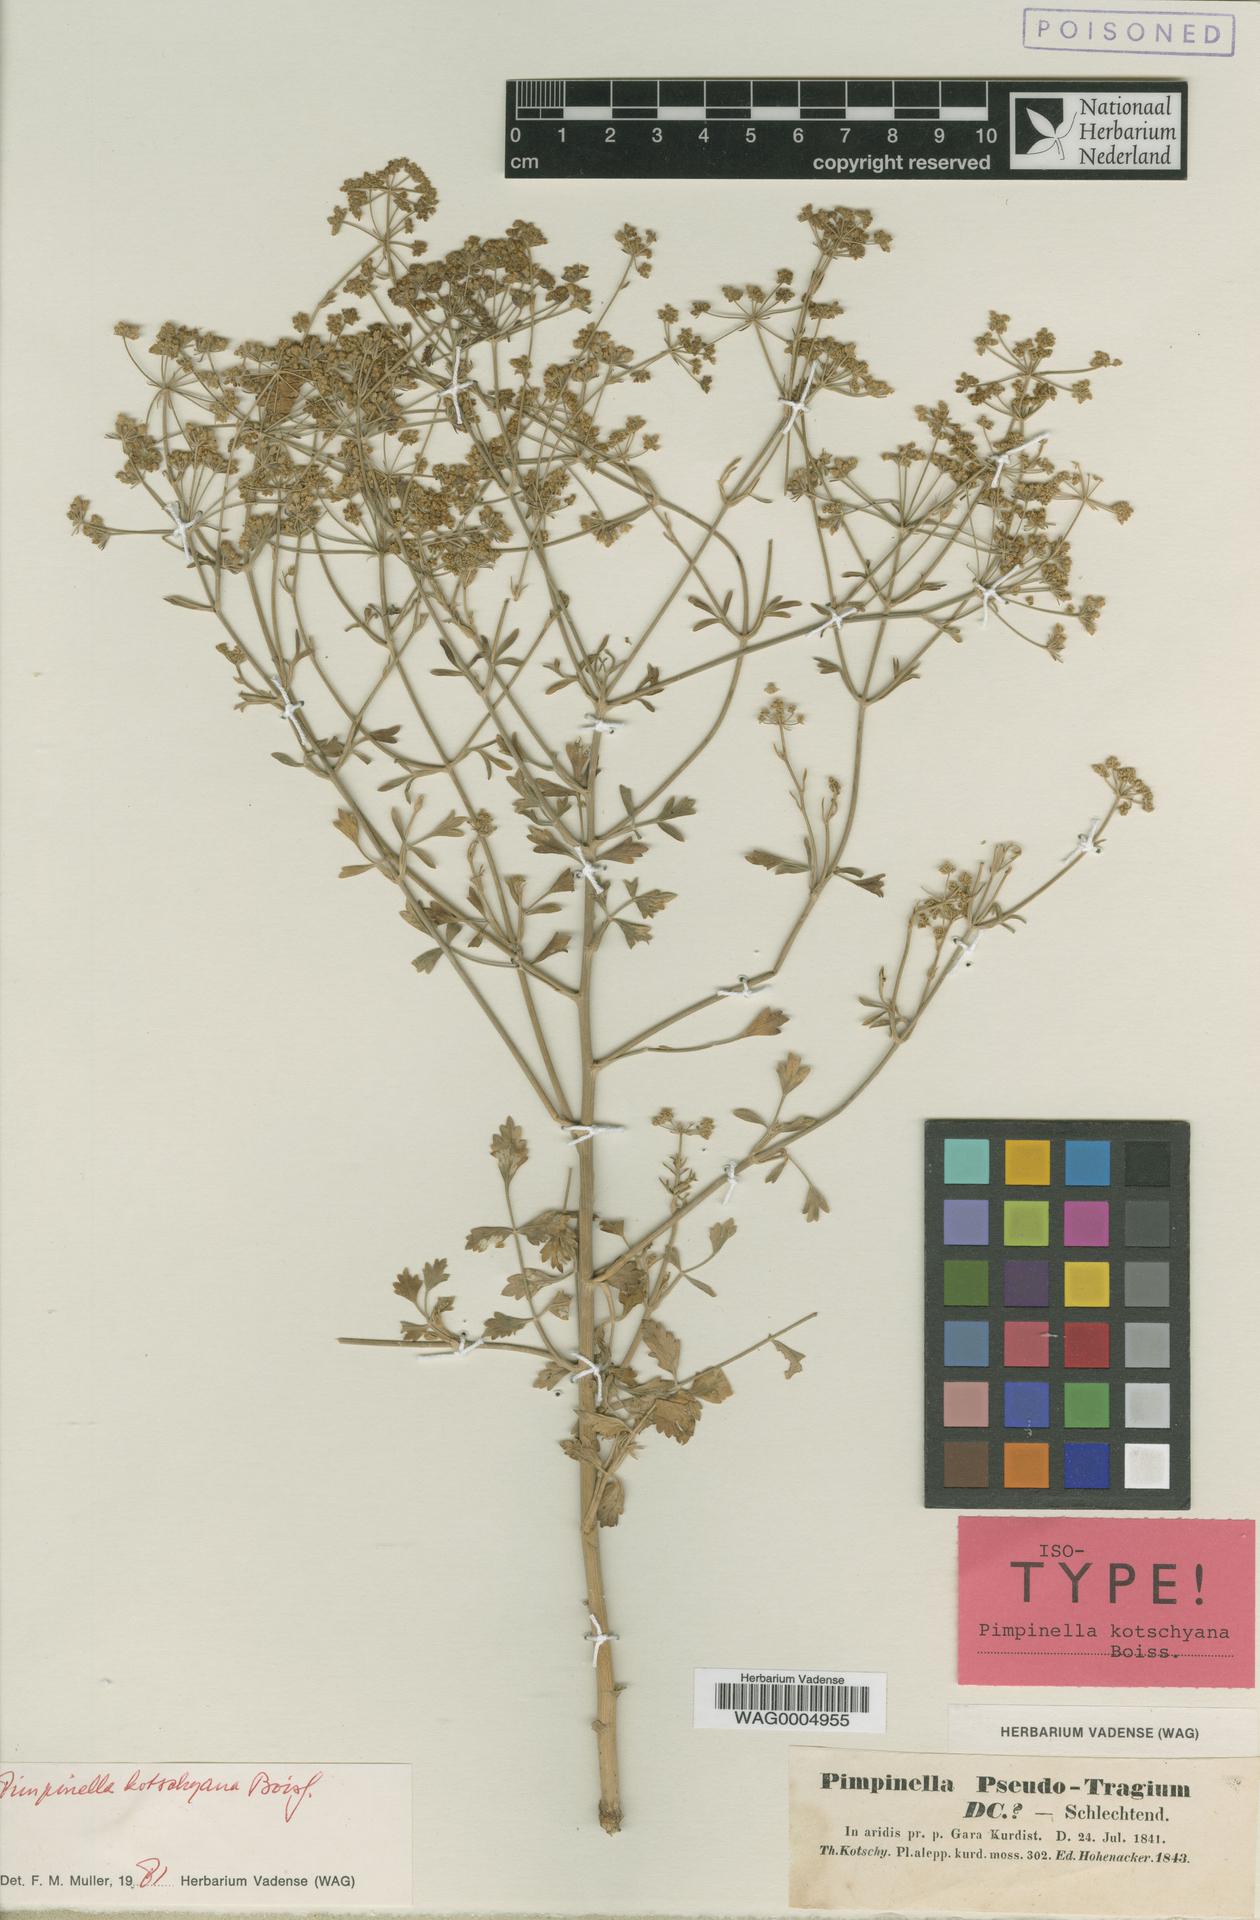 WAG.1854103 | Pimpinella kotschyana Boiss.